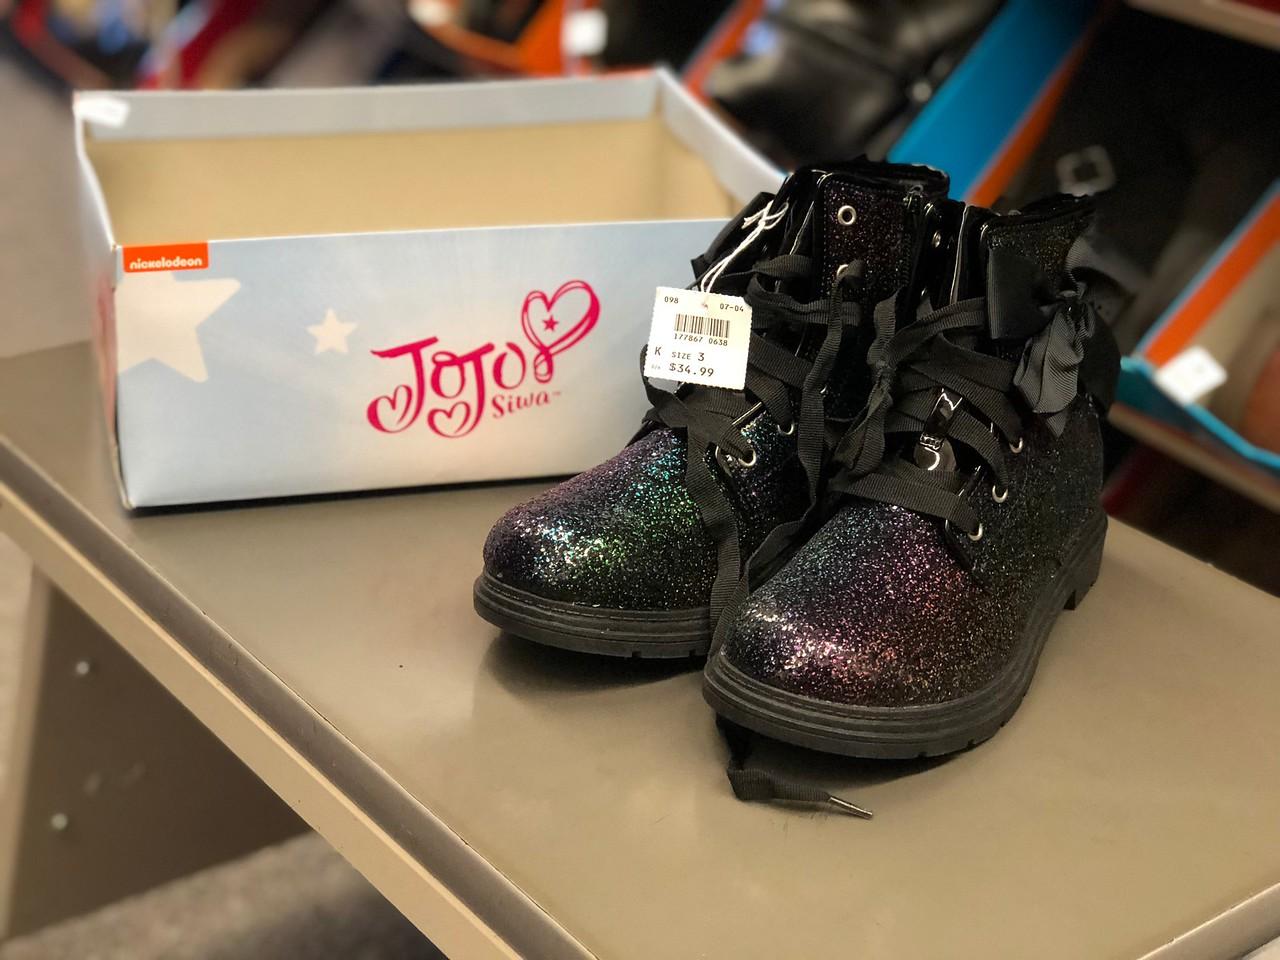 Off JoJo Siwa Shoes (Sandals, High-Tops